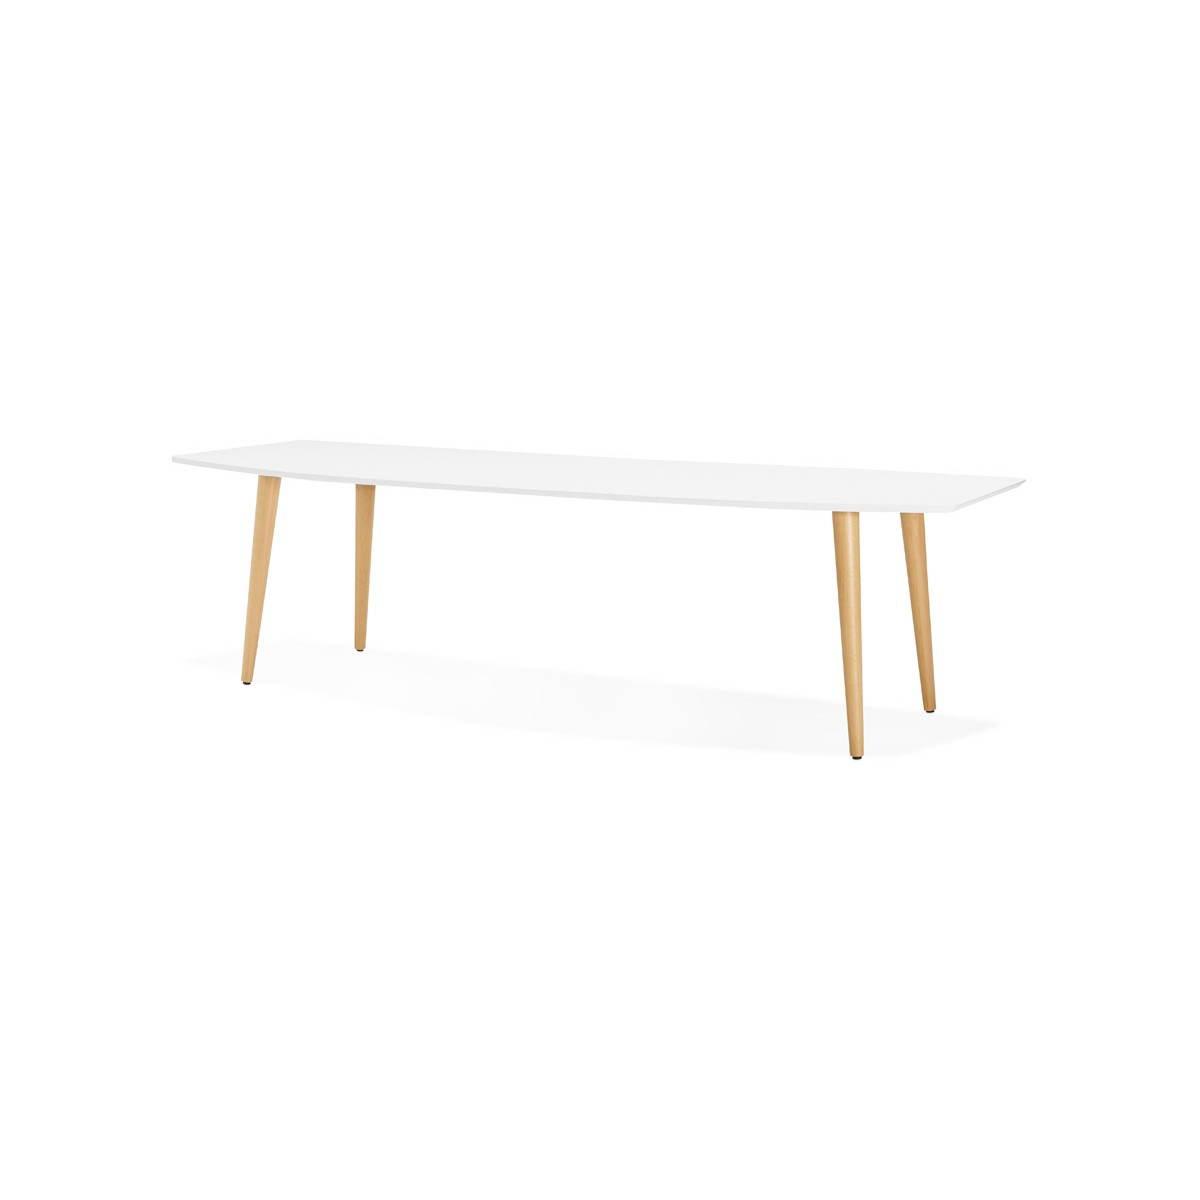 table a manger style scandinave avec rallonges trine en bois 170 270cmx100cmx74 8cm blanc